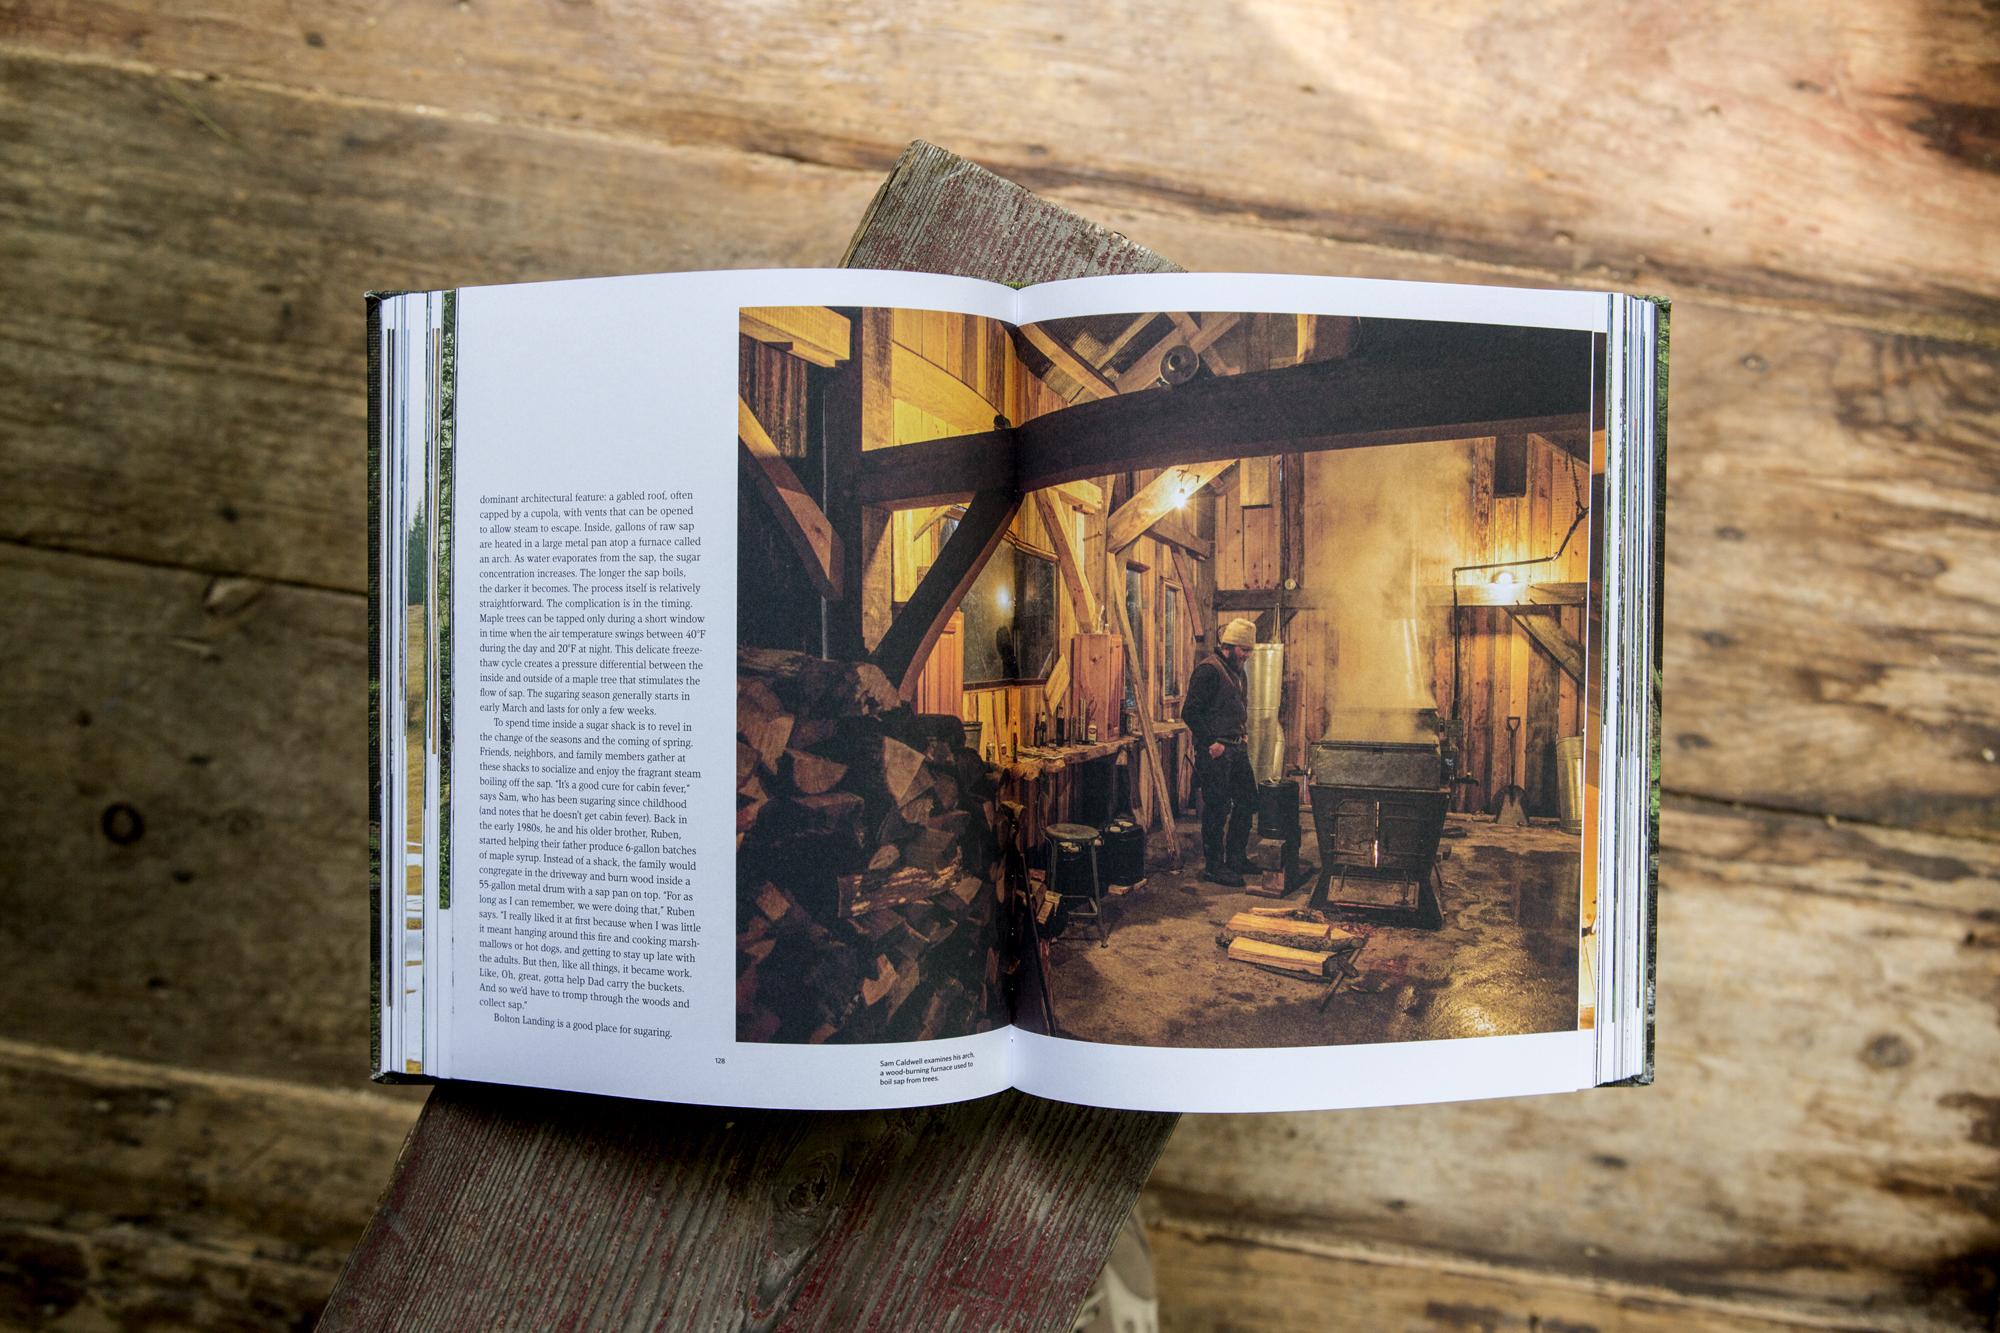 beaver-brook-cabin-porn-book-8